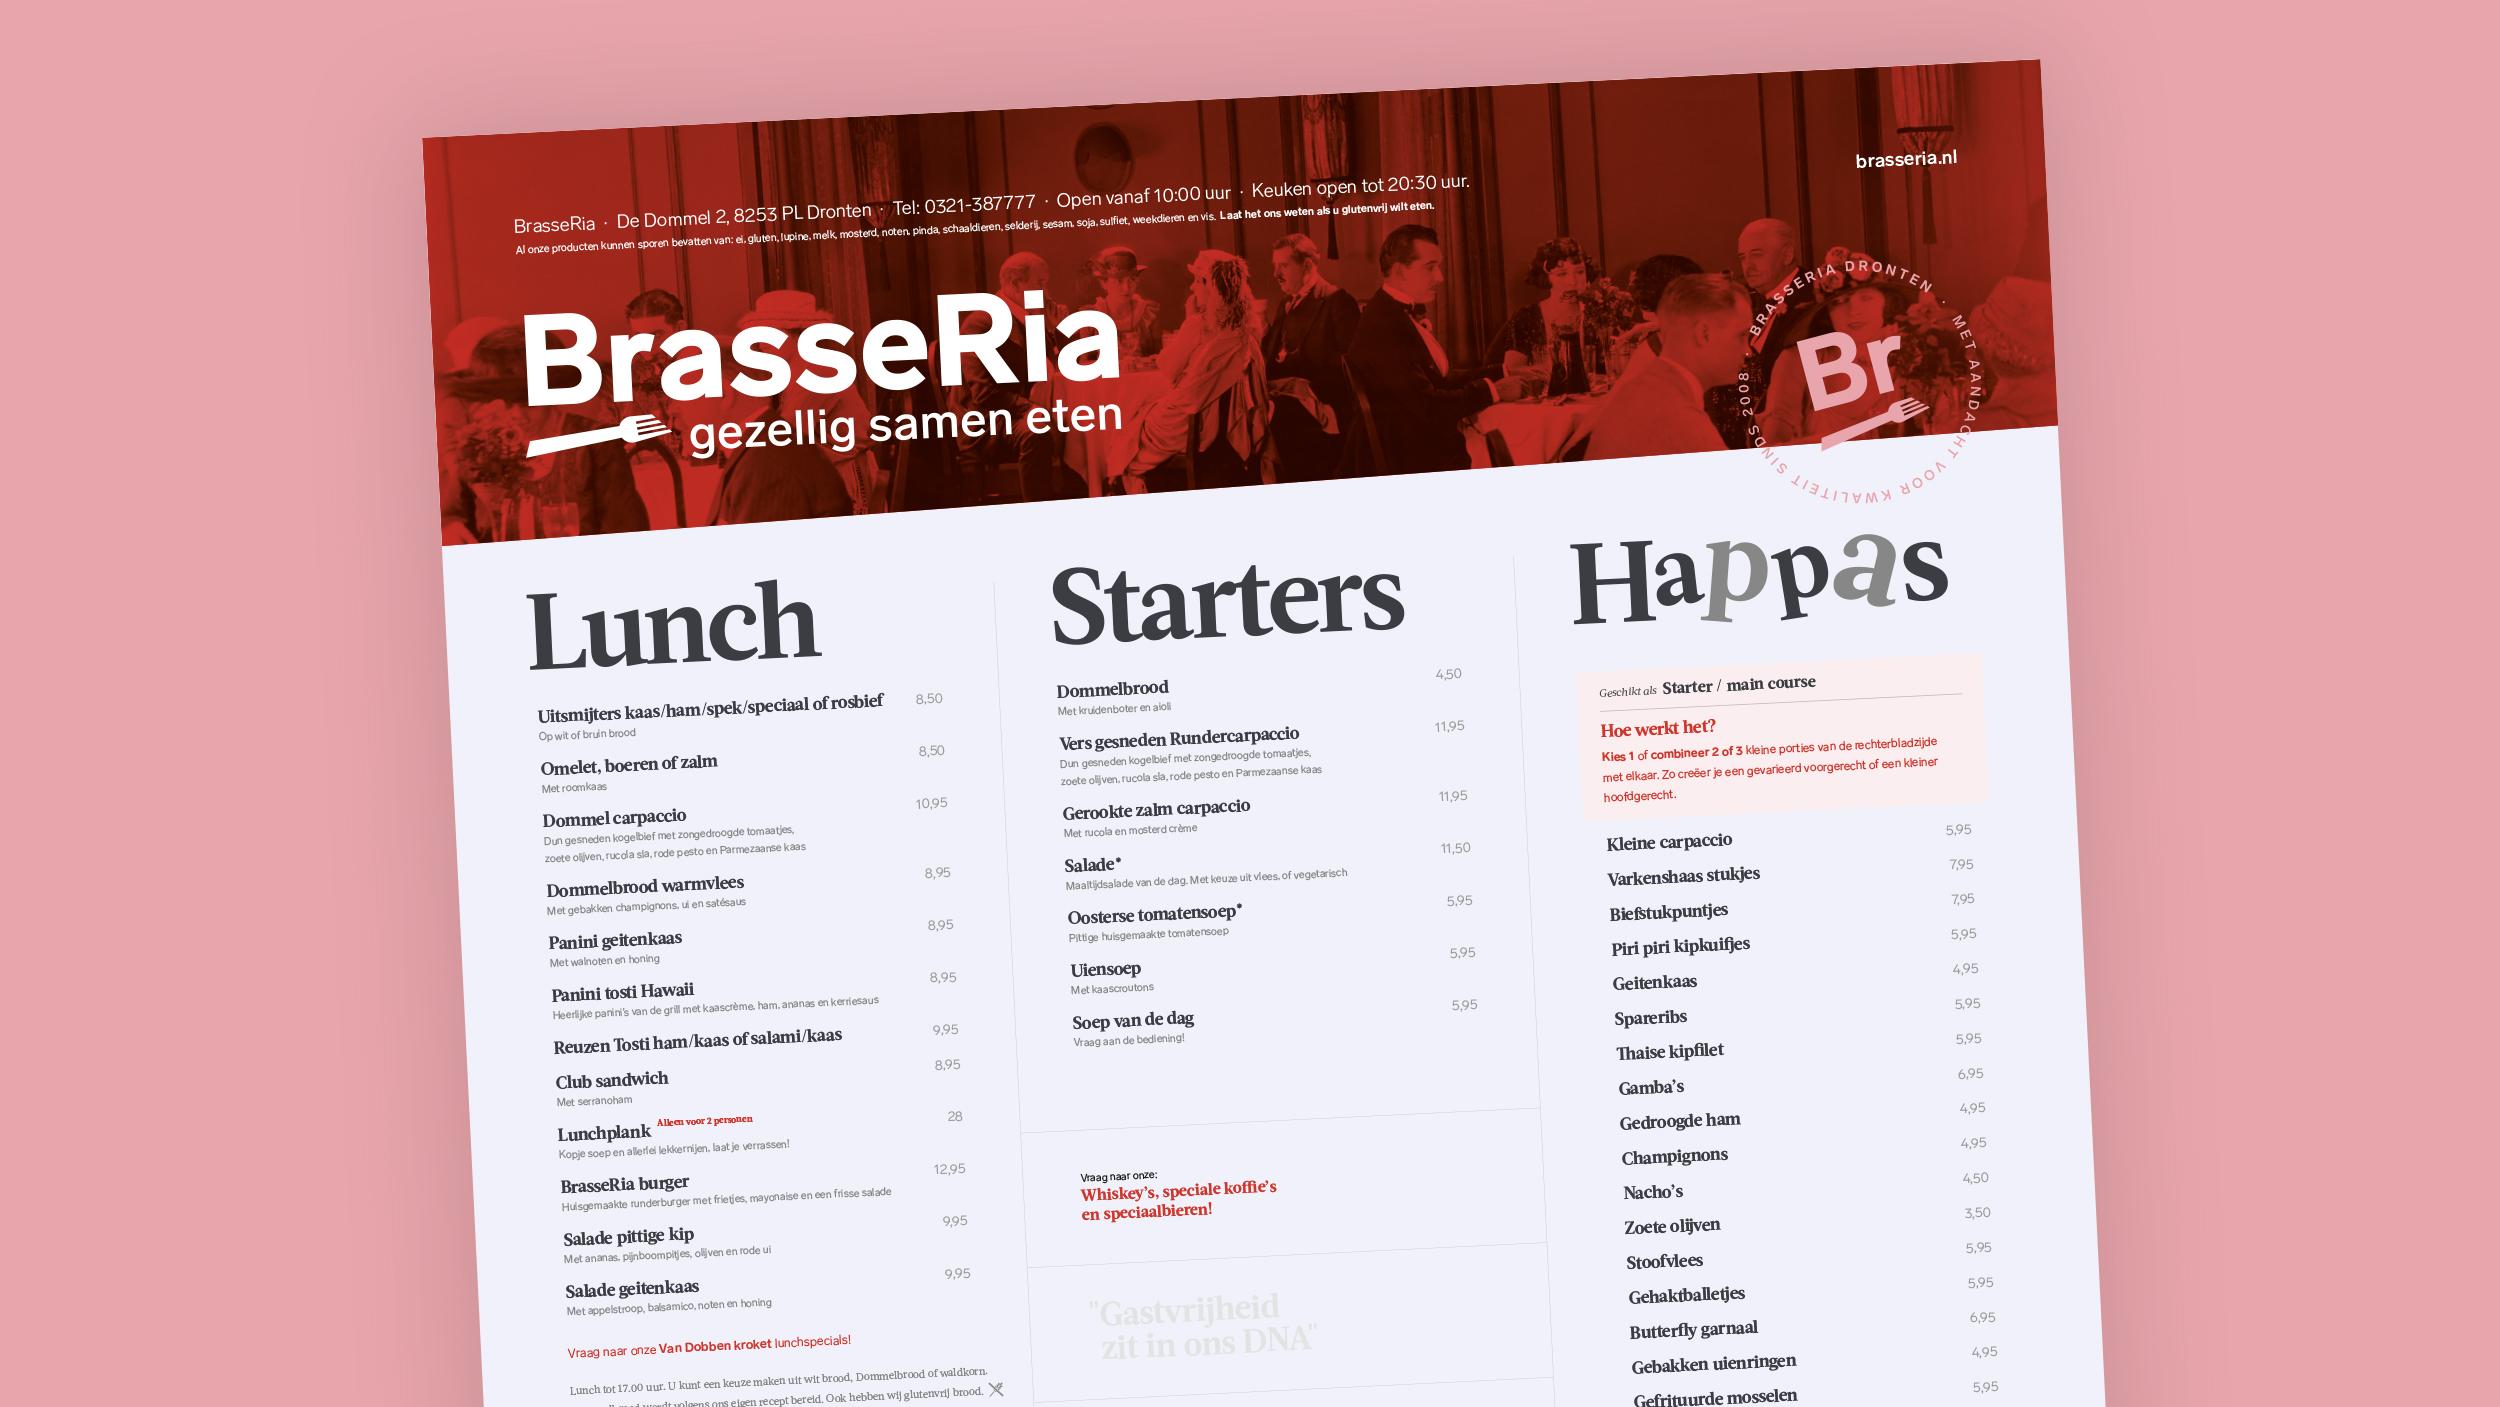 BrasseRia (buiten) menukaart